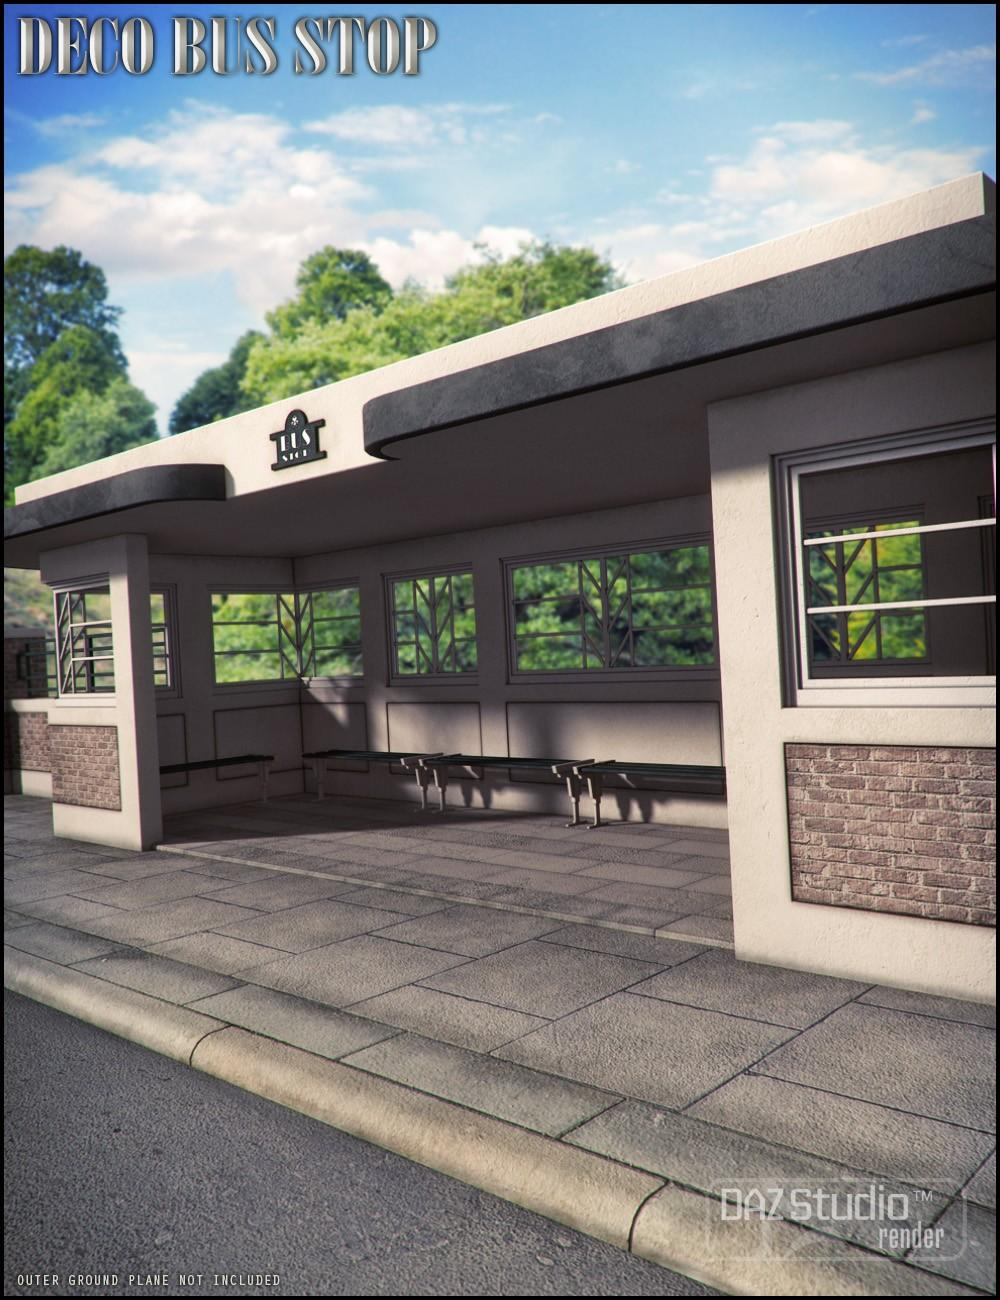 Deco Bus Stop